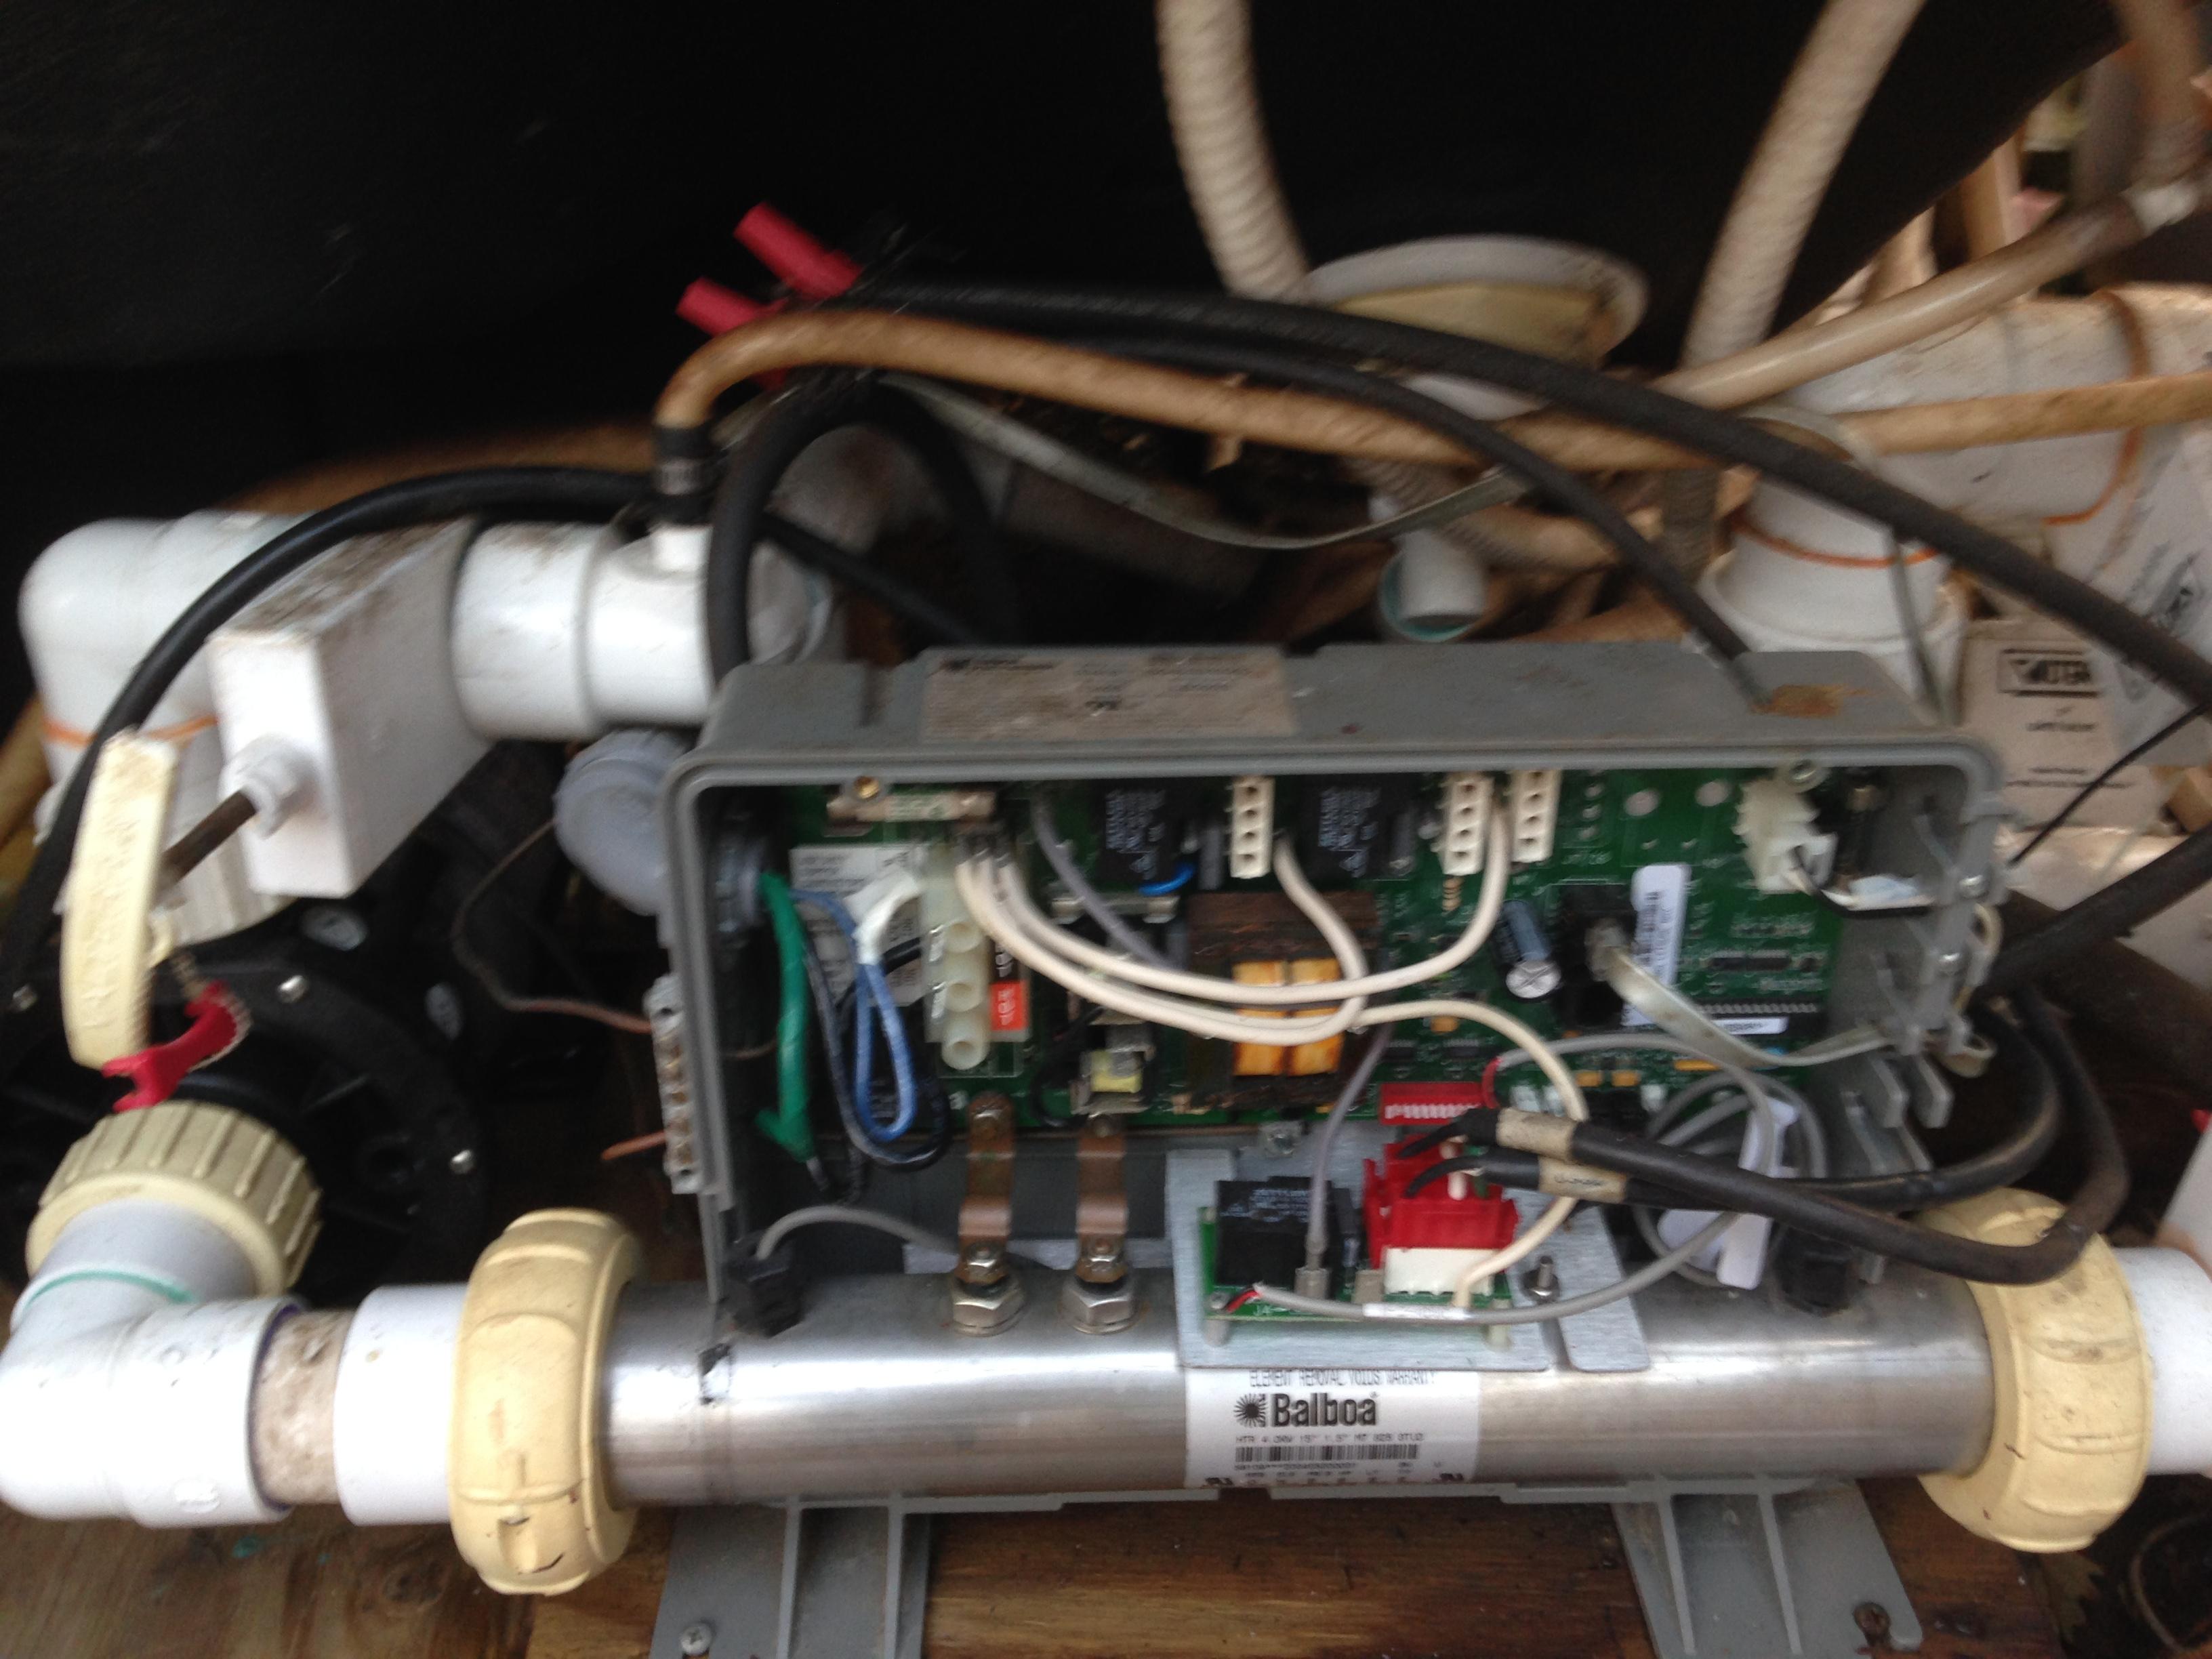 Have a leasure bay hot tub with balboa controls pumps where ... Balboa Spa Wiring Diagram on